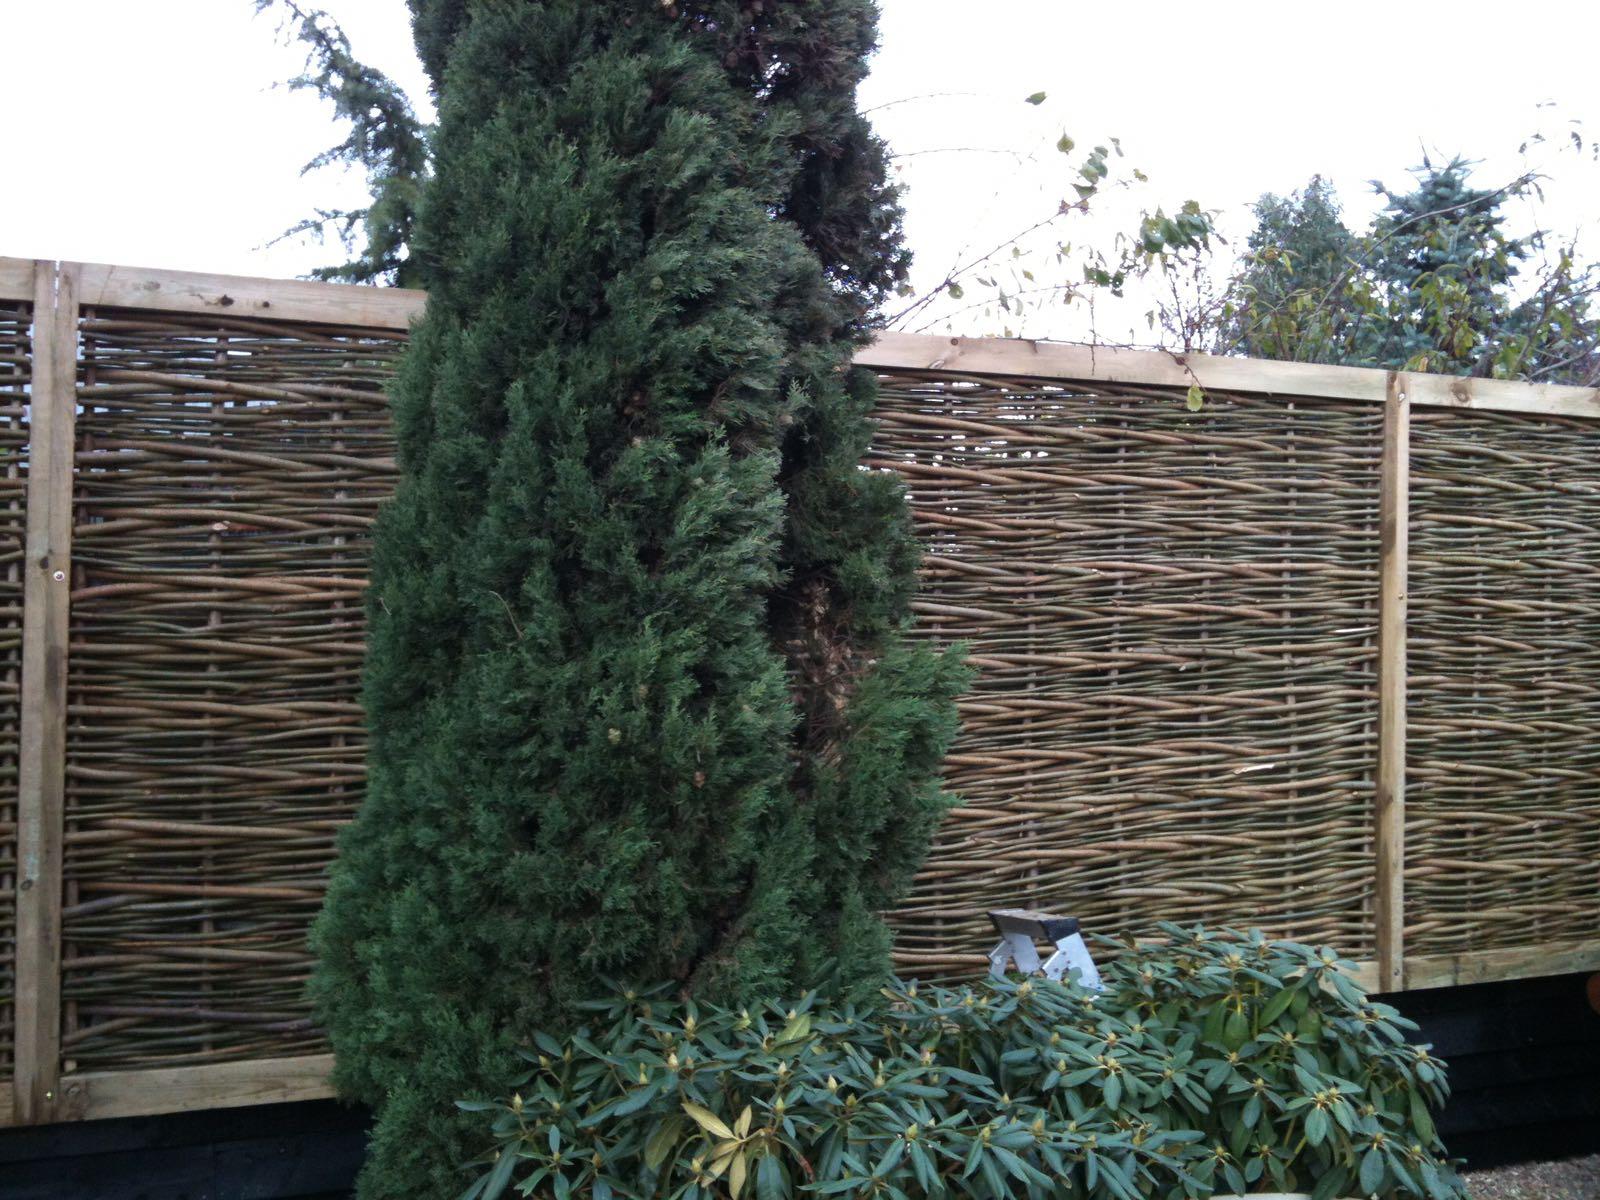 Woven willow frames